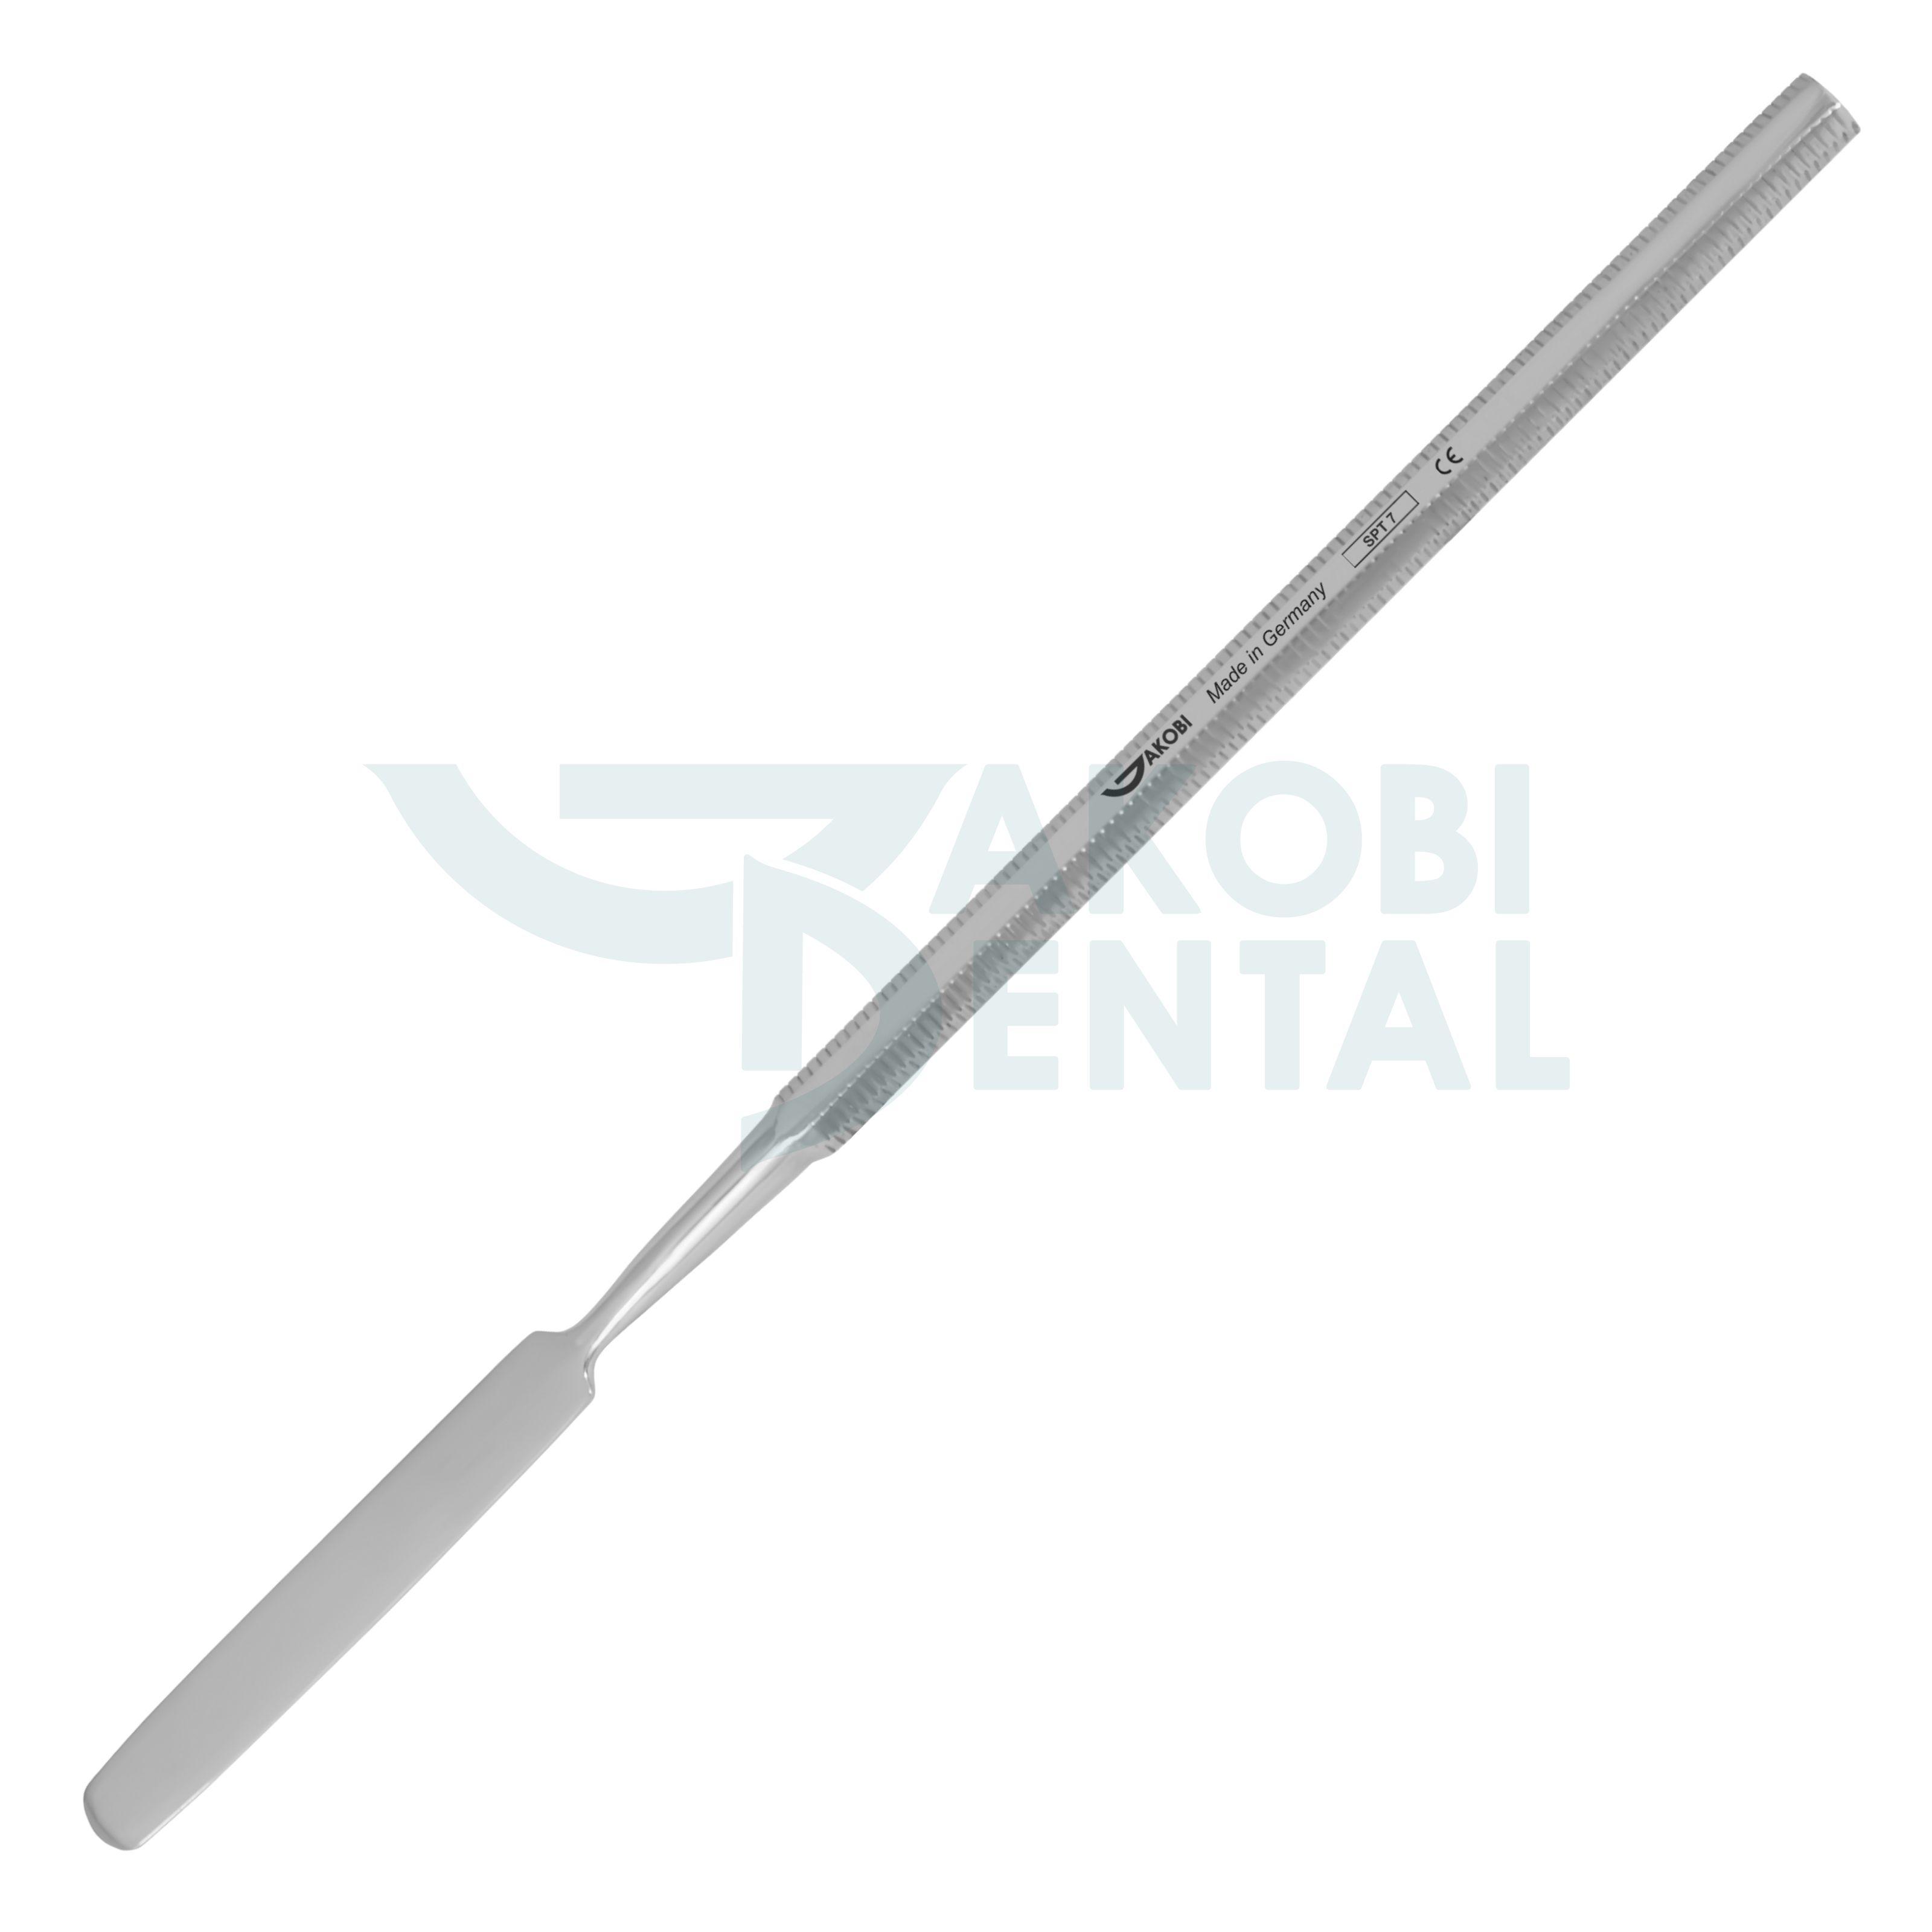 Zementspatel # 7, Breite 7 mm